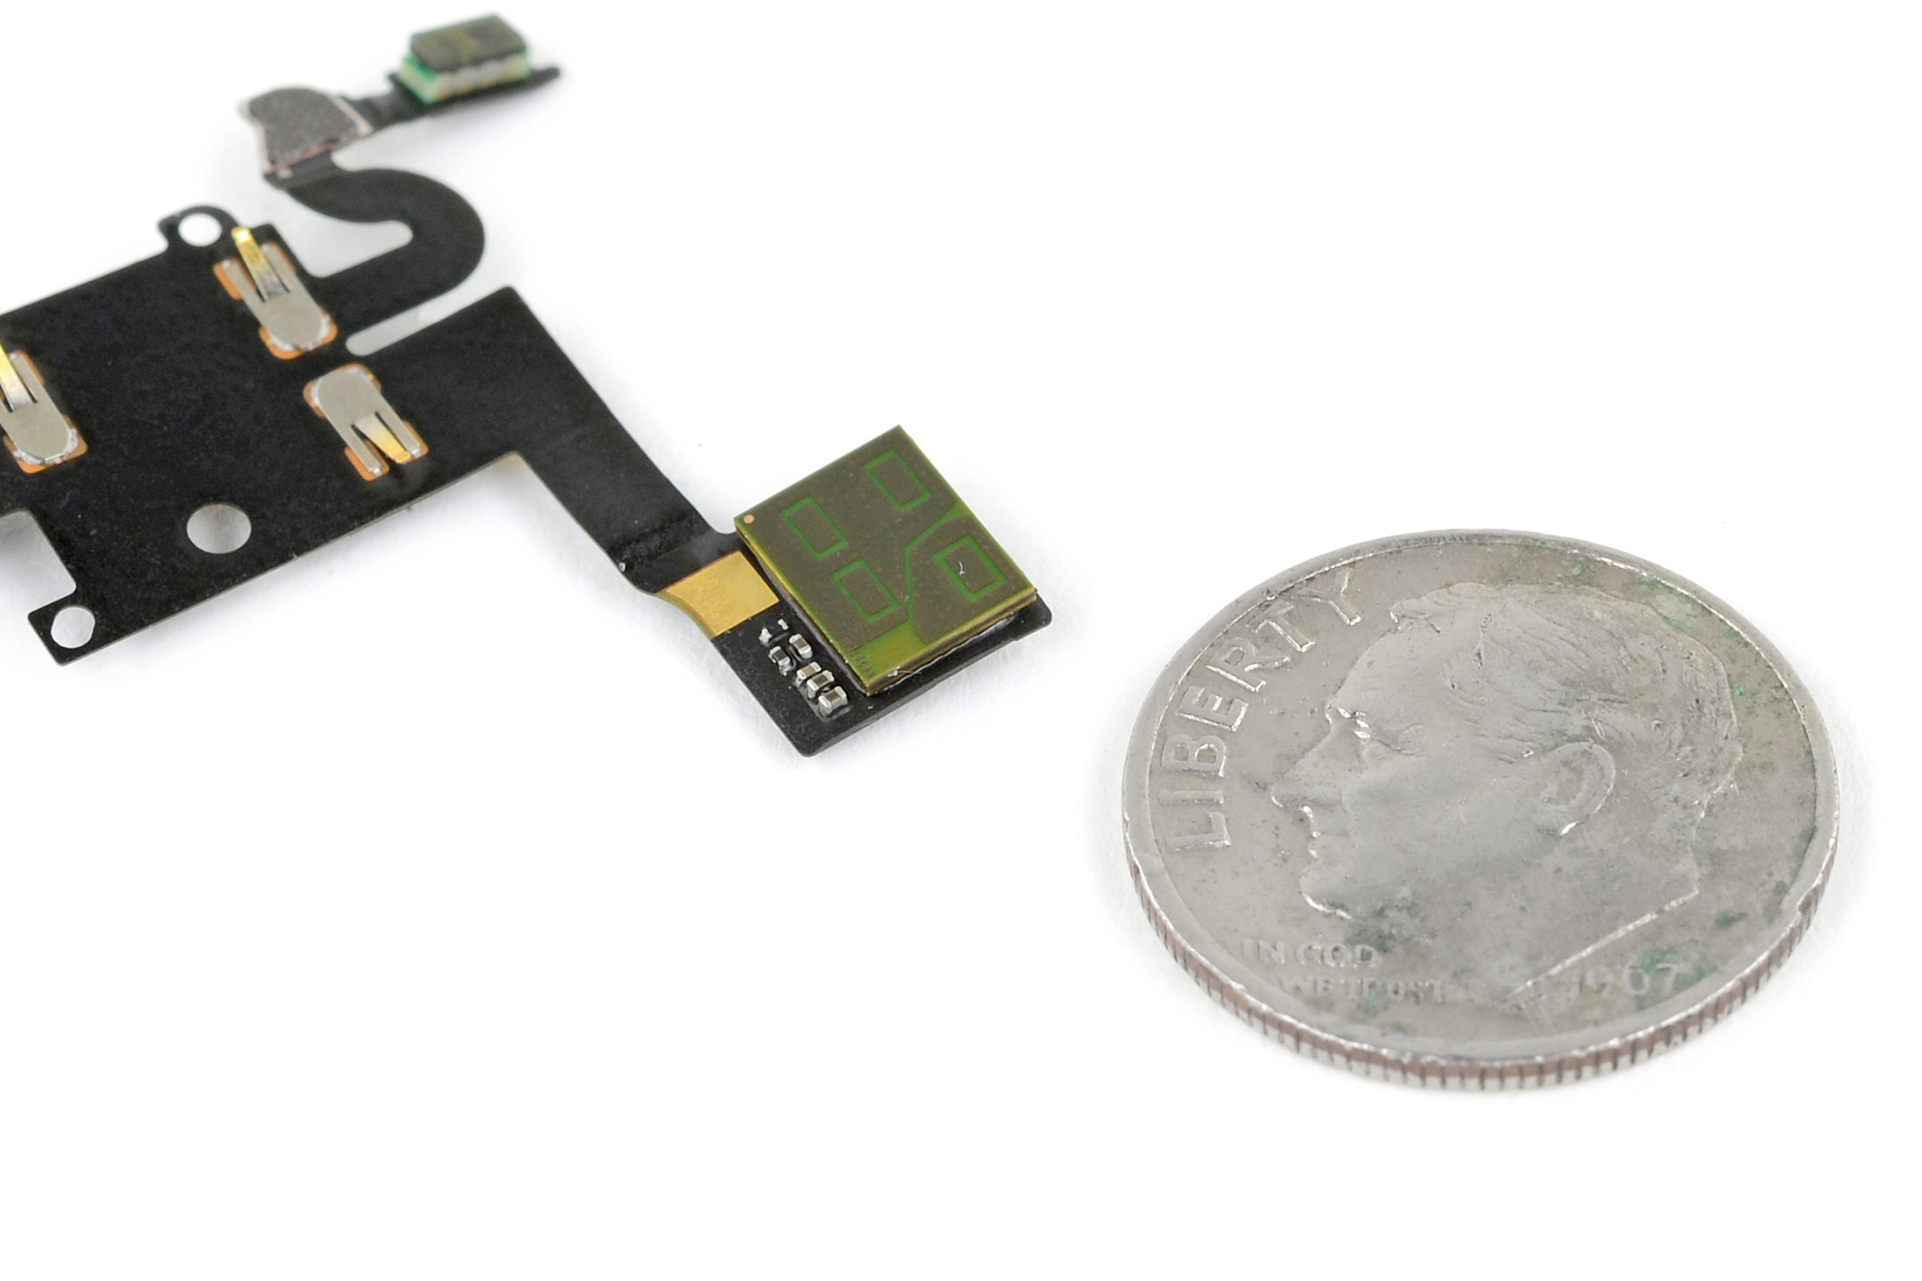 The Pixel 4's Soli sensor next to a US dime for size comparison